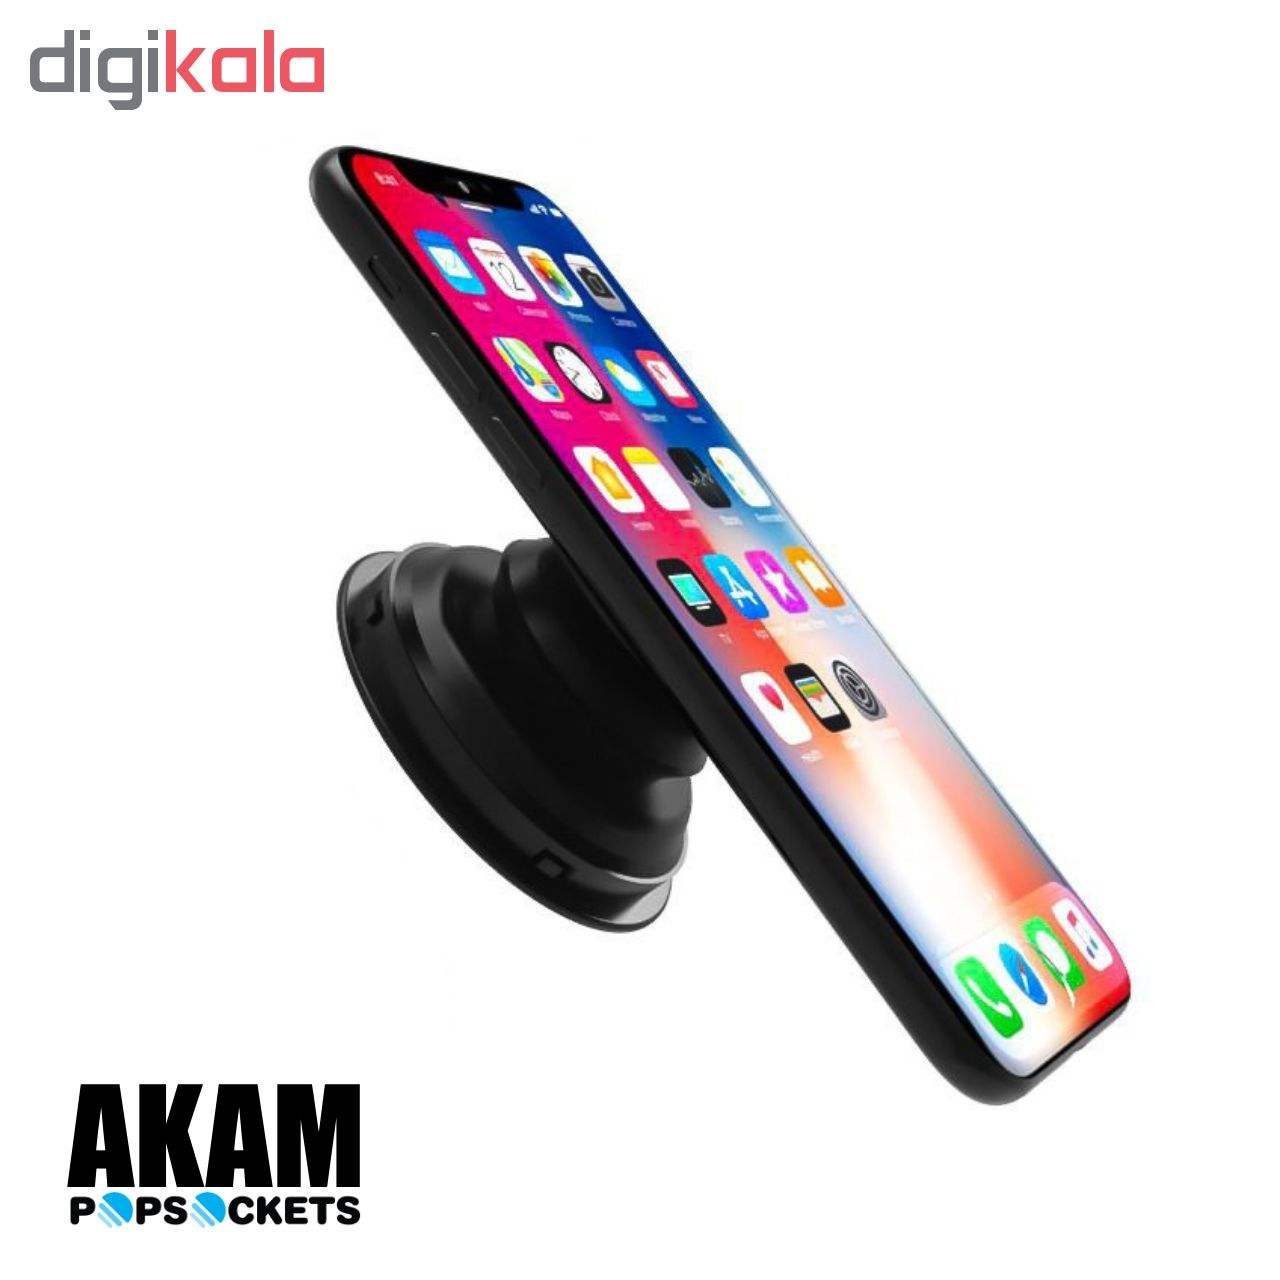 پایه نگهدارنده گوشی  موبایل پاپ سوکت آکام مدل APS0014 main 1 9